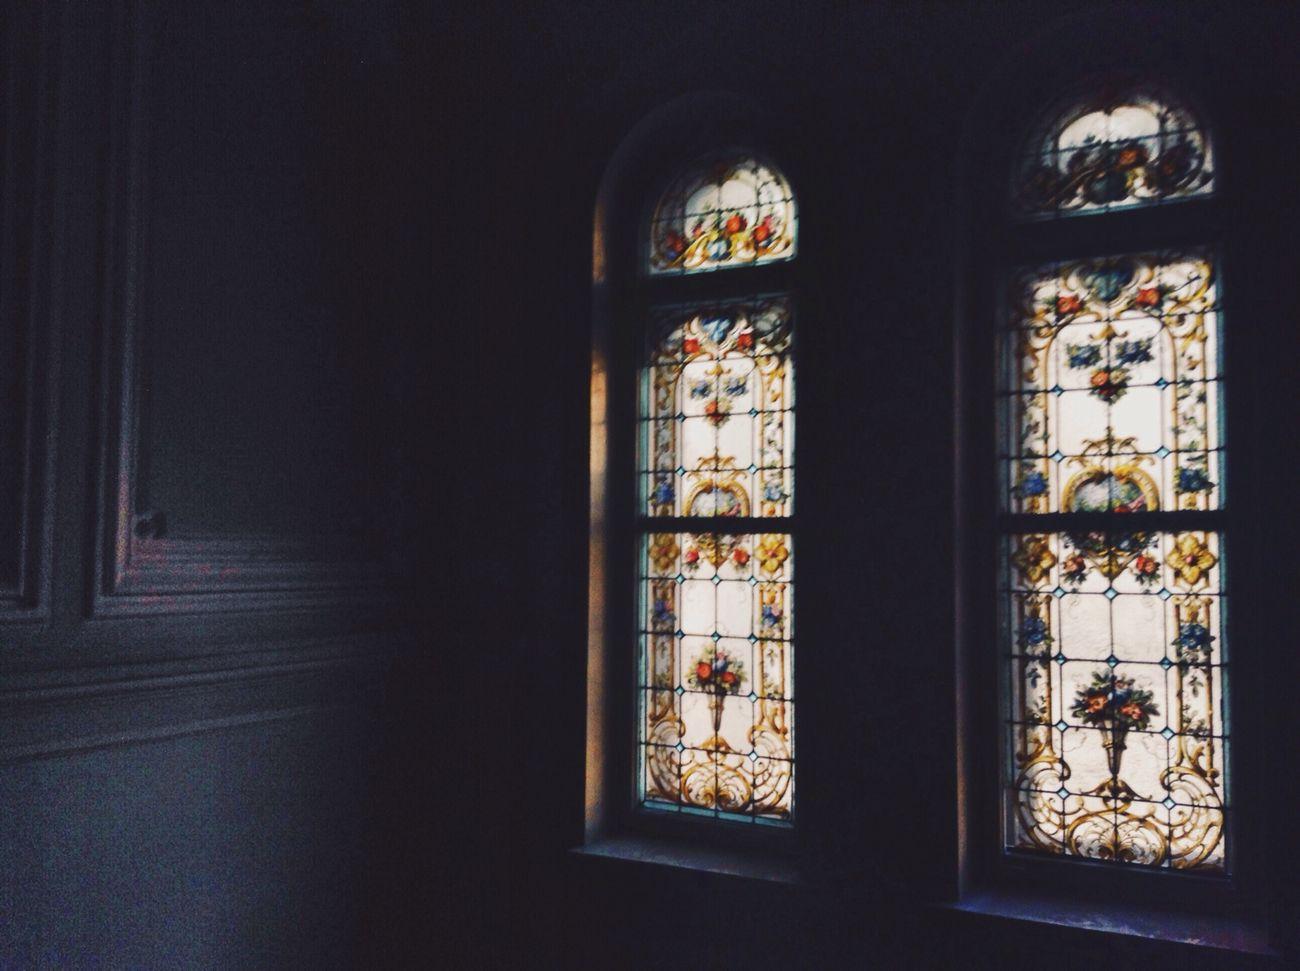 Taking Photos Interior Architecture